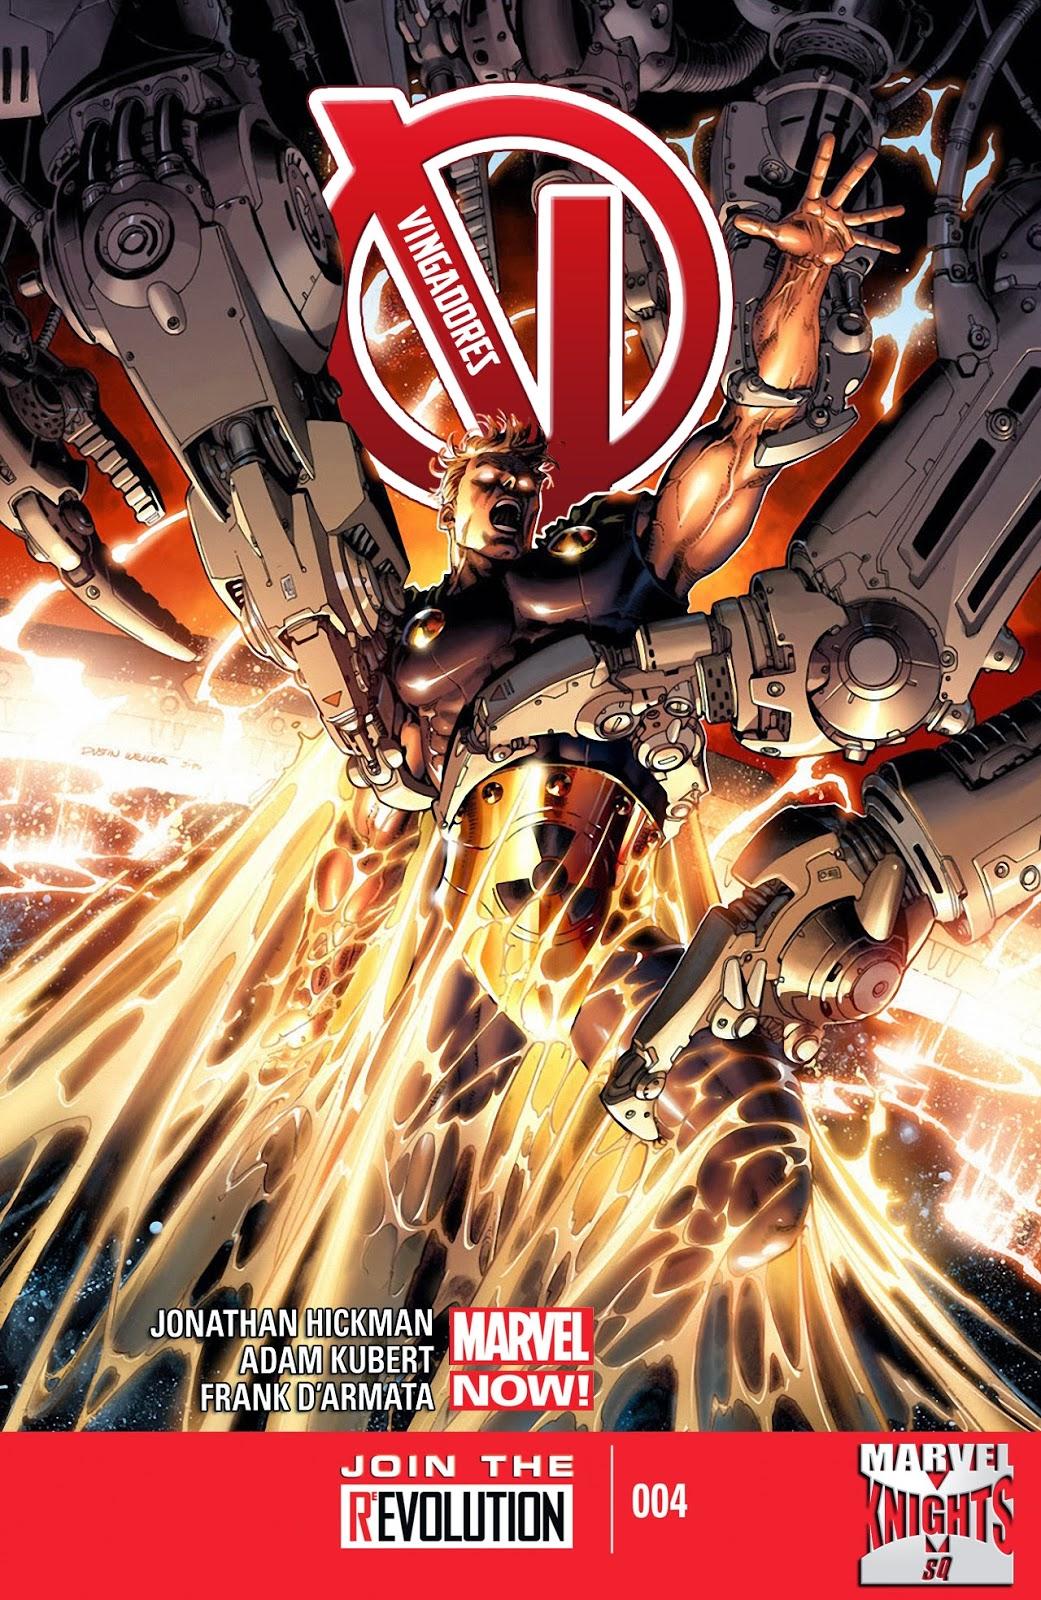 Nova Marvel! Vingadores #4